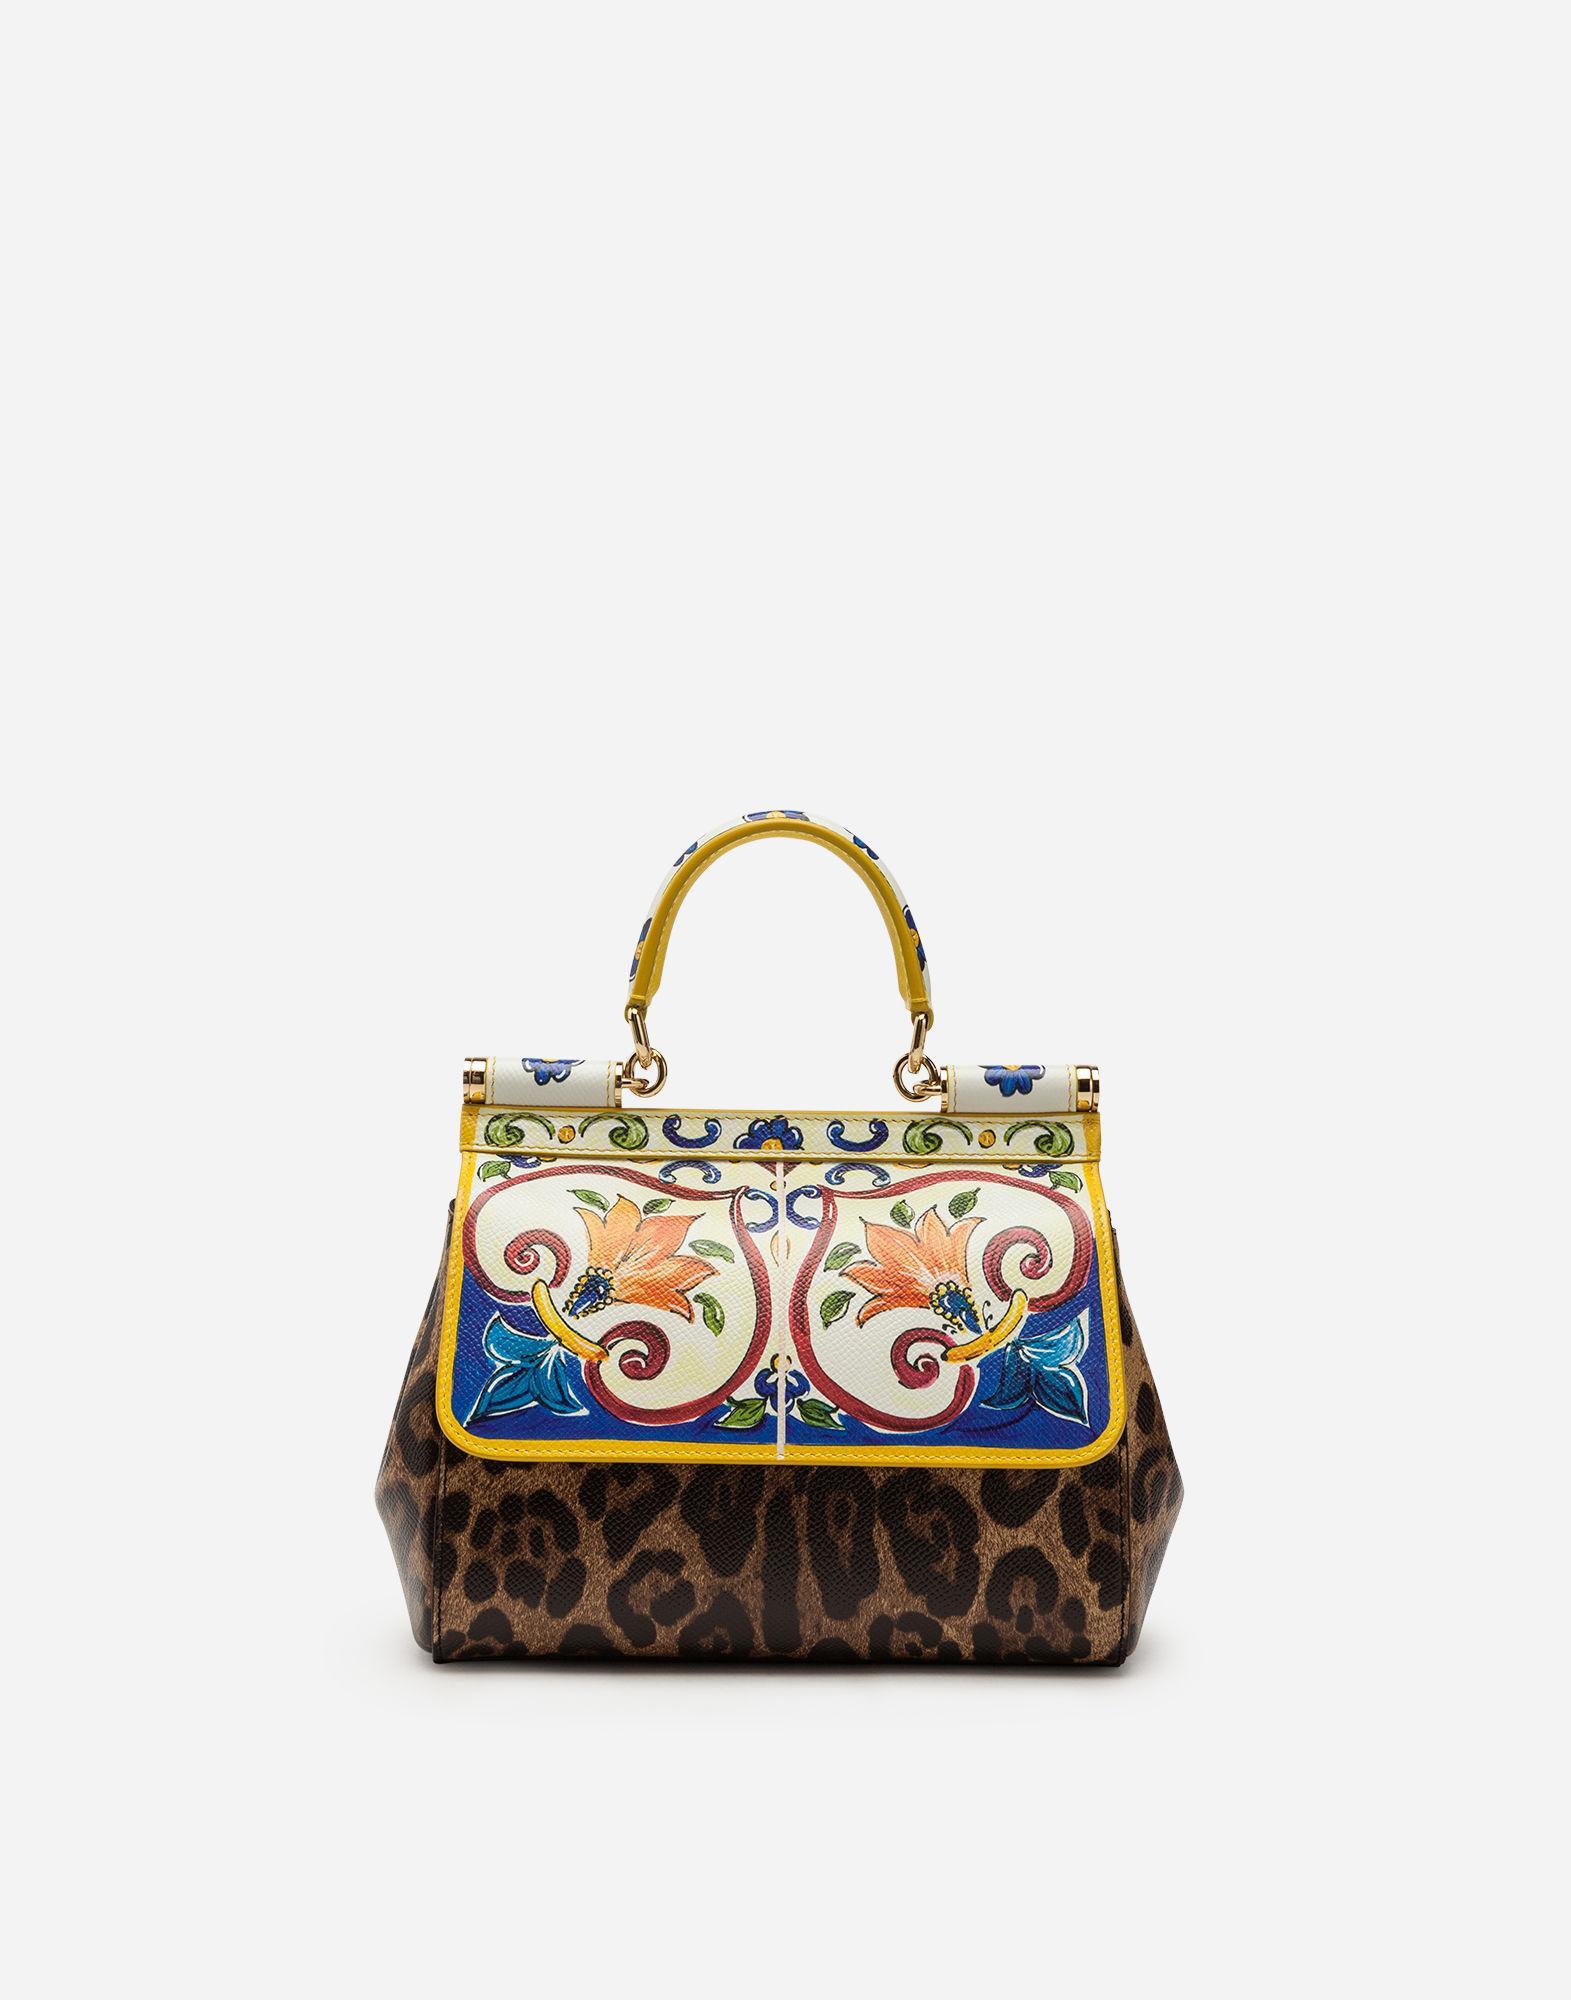 7011923a2444 Dolce   Gabbana Small Sicily Media Bag In Printed Dauphine Calfskin ...